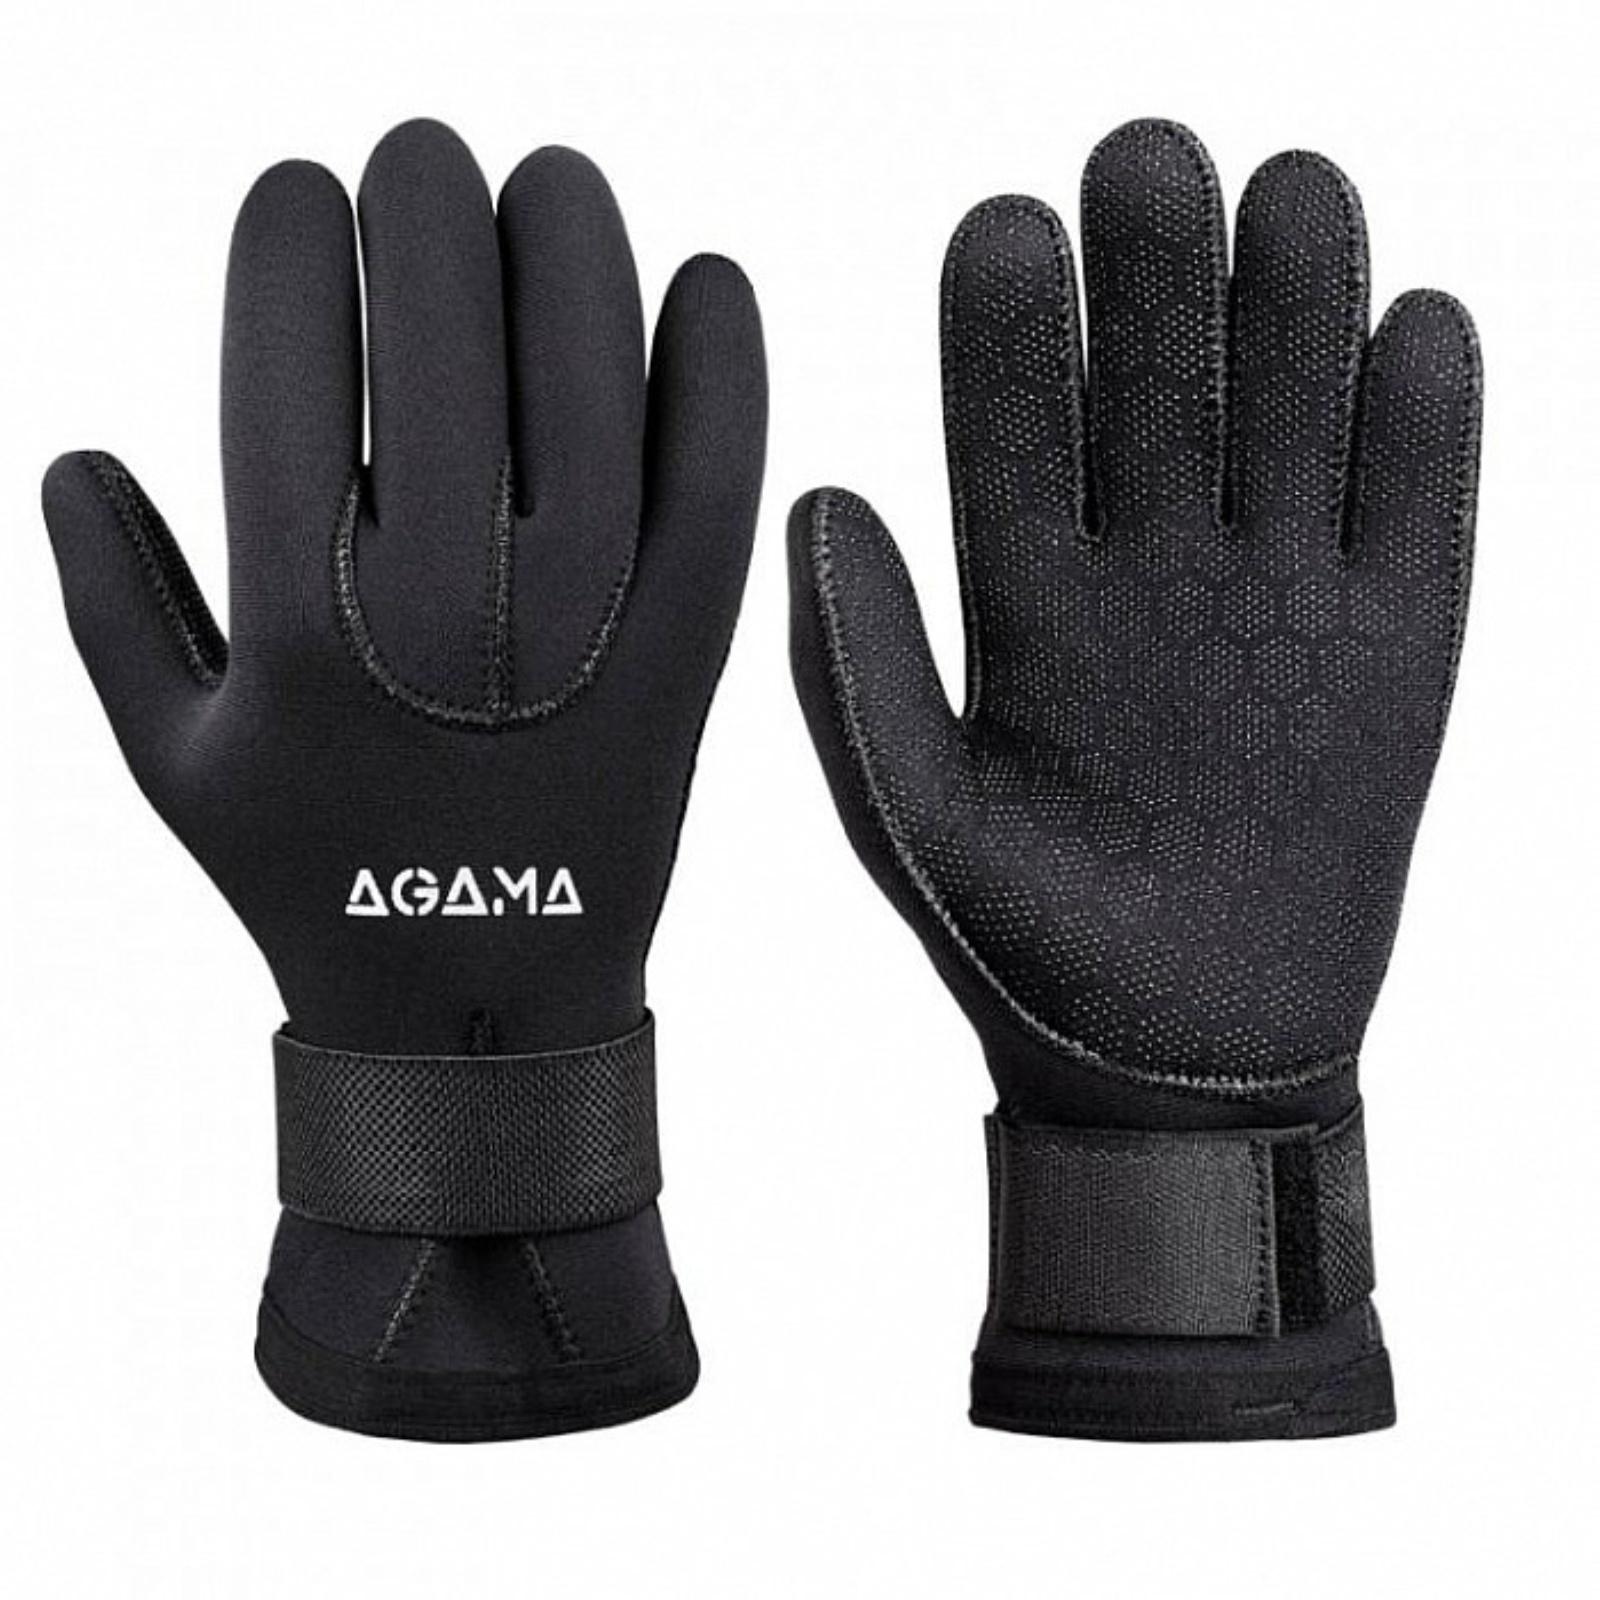 Neoprenové rukavice AGAMA Classic 5 mm - vel. L